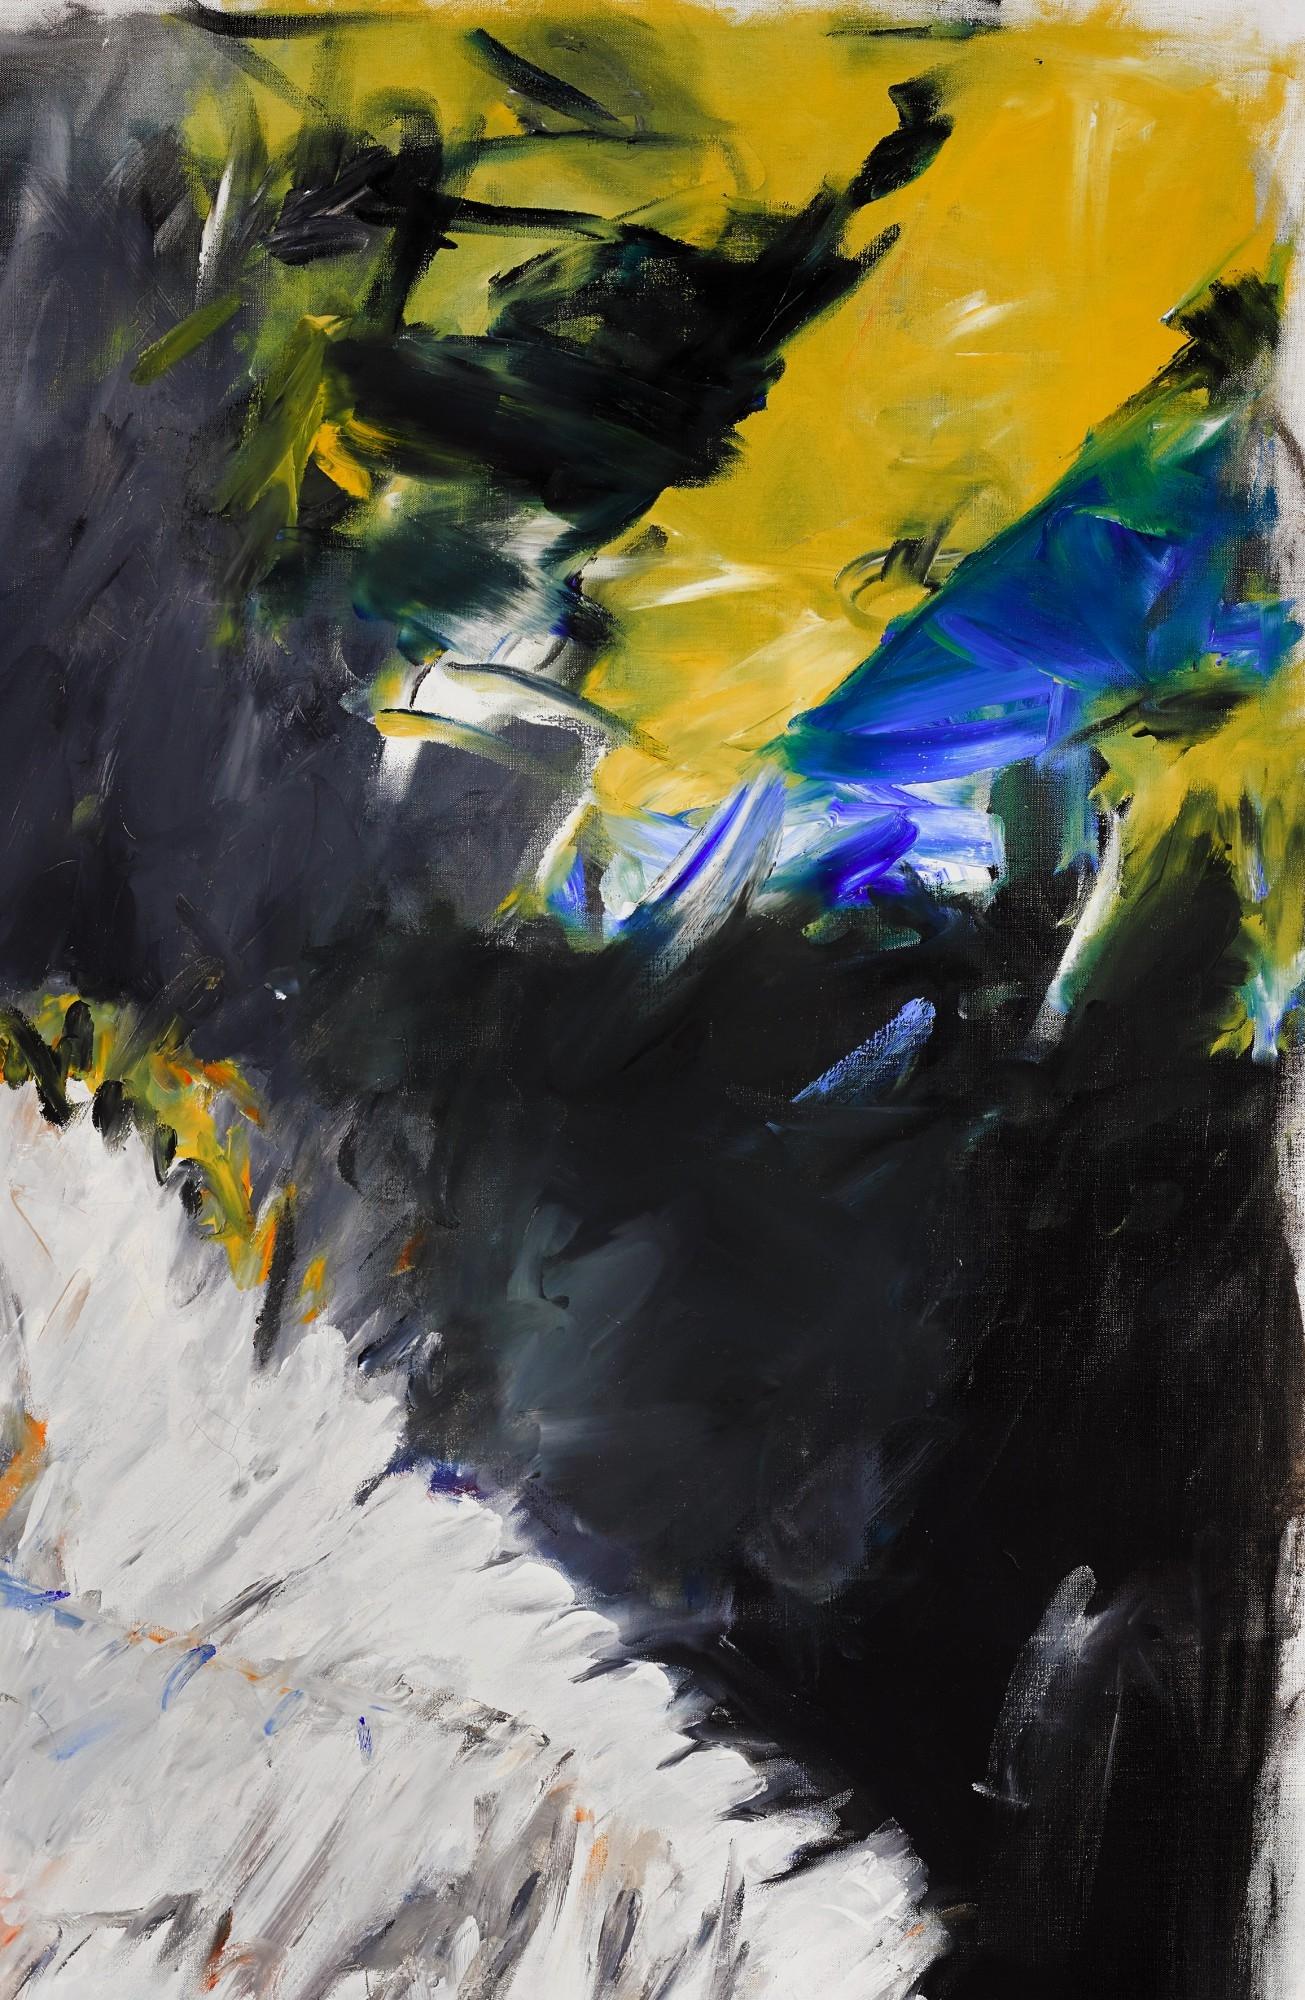 Painter / Sculptor - Georg Baselitz, George Condo, Eric